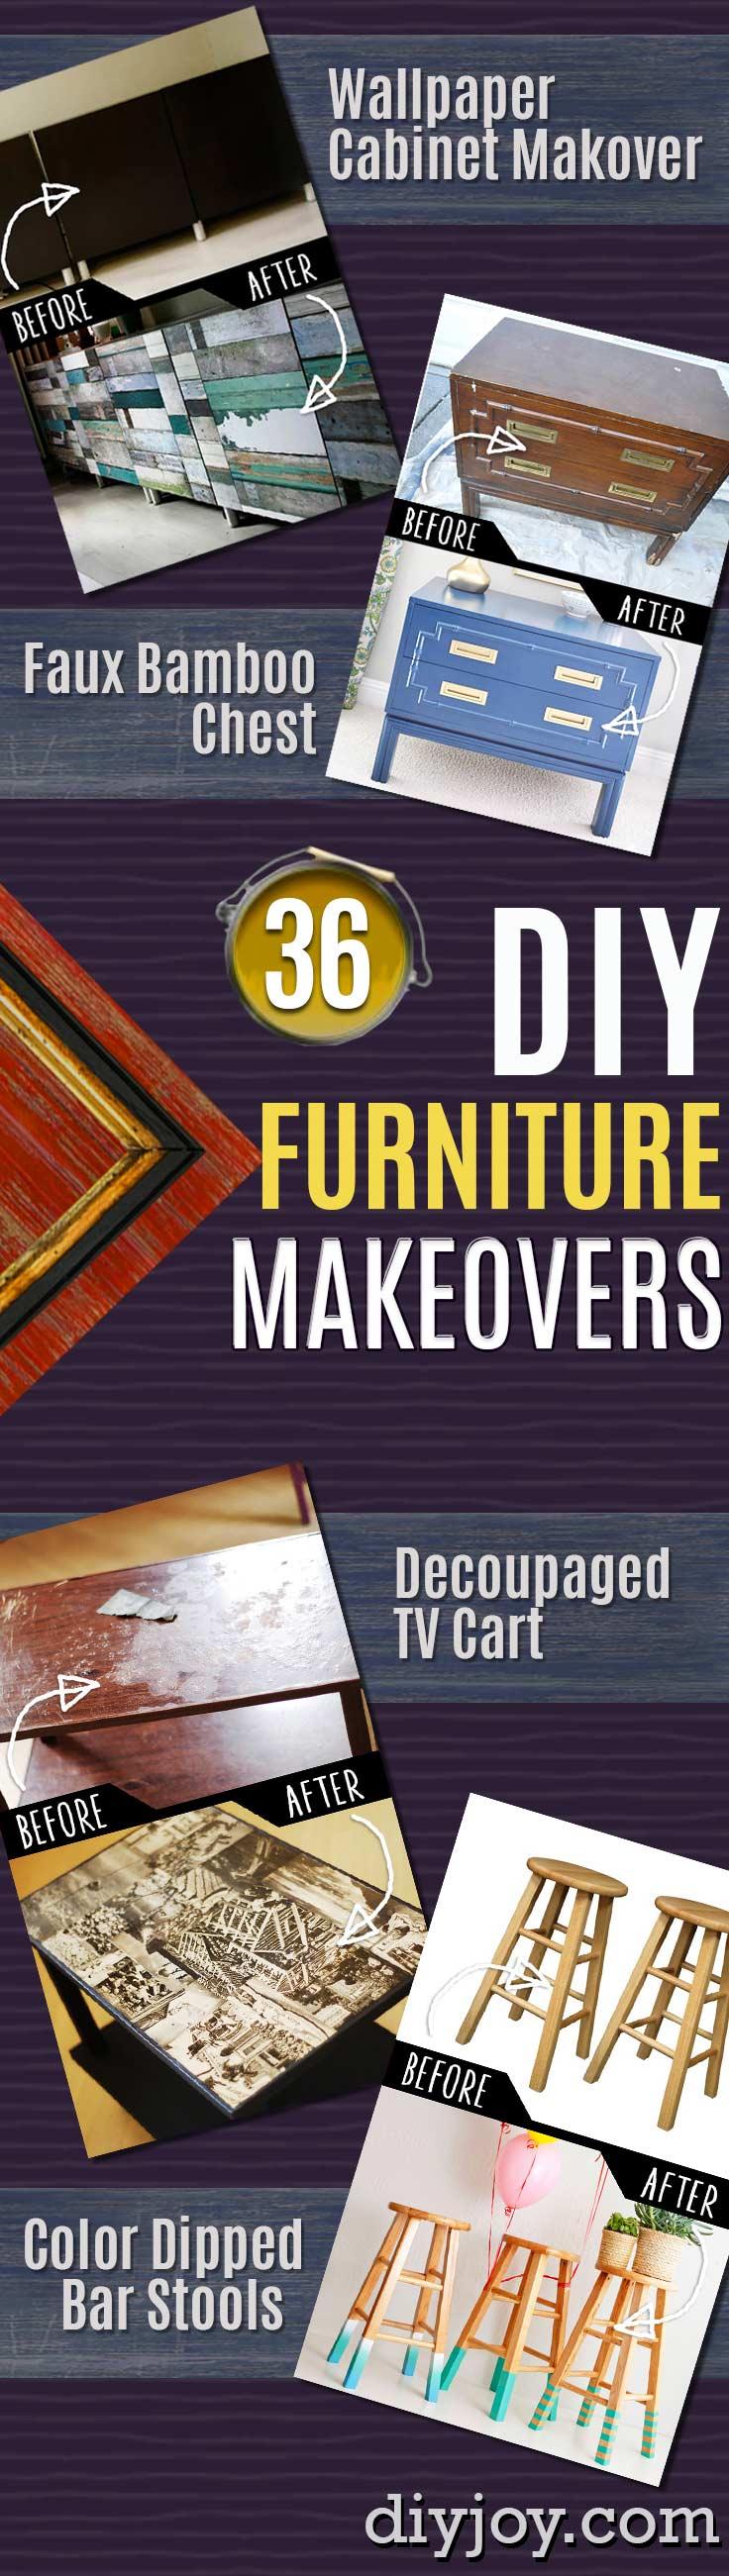 36 DIY Furniture Makeovers